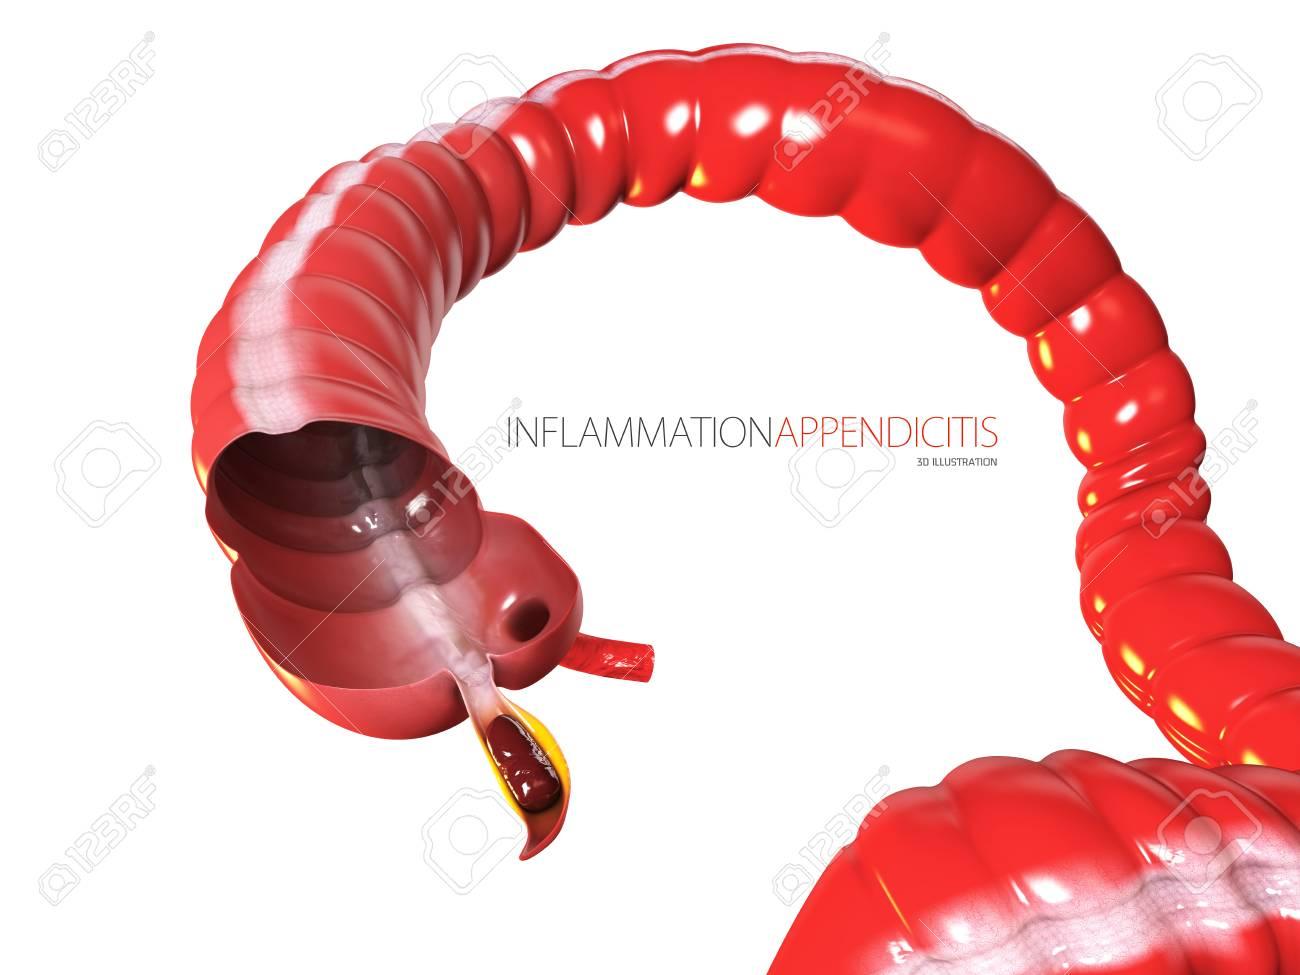 Inflammantion Appendicitis Concept Human Intestine Anatomy As